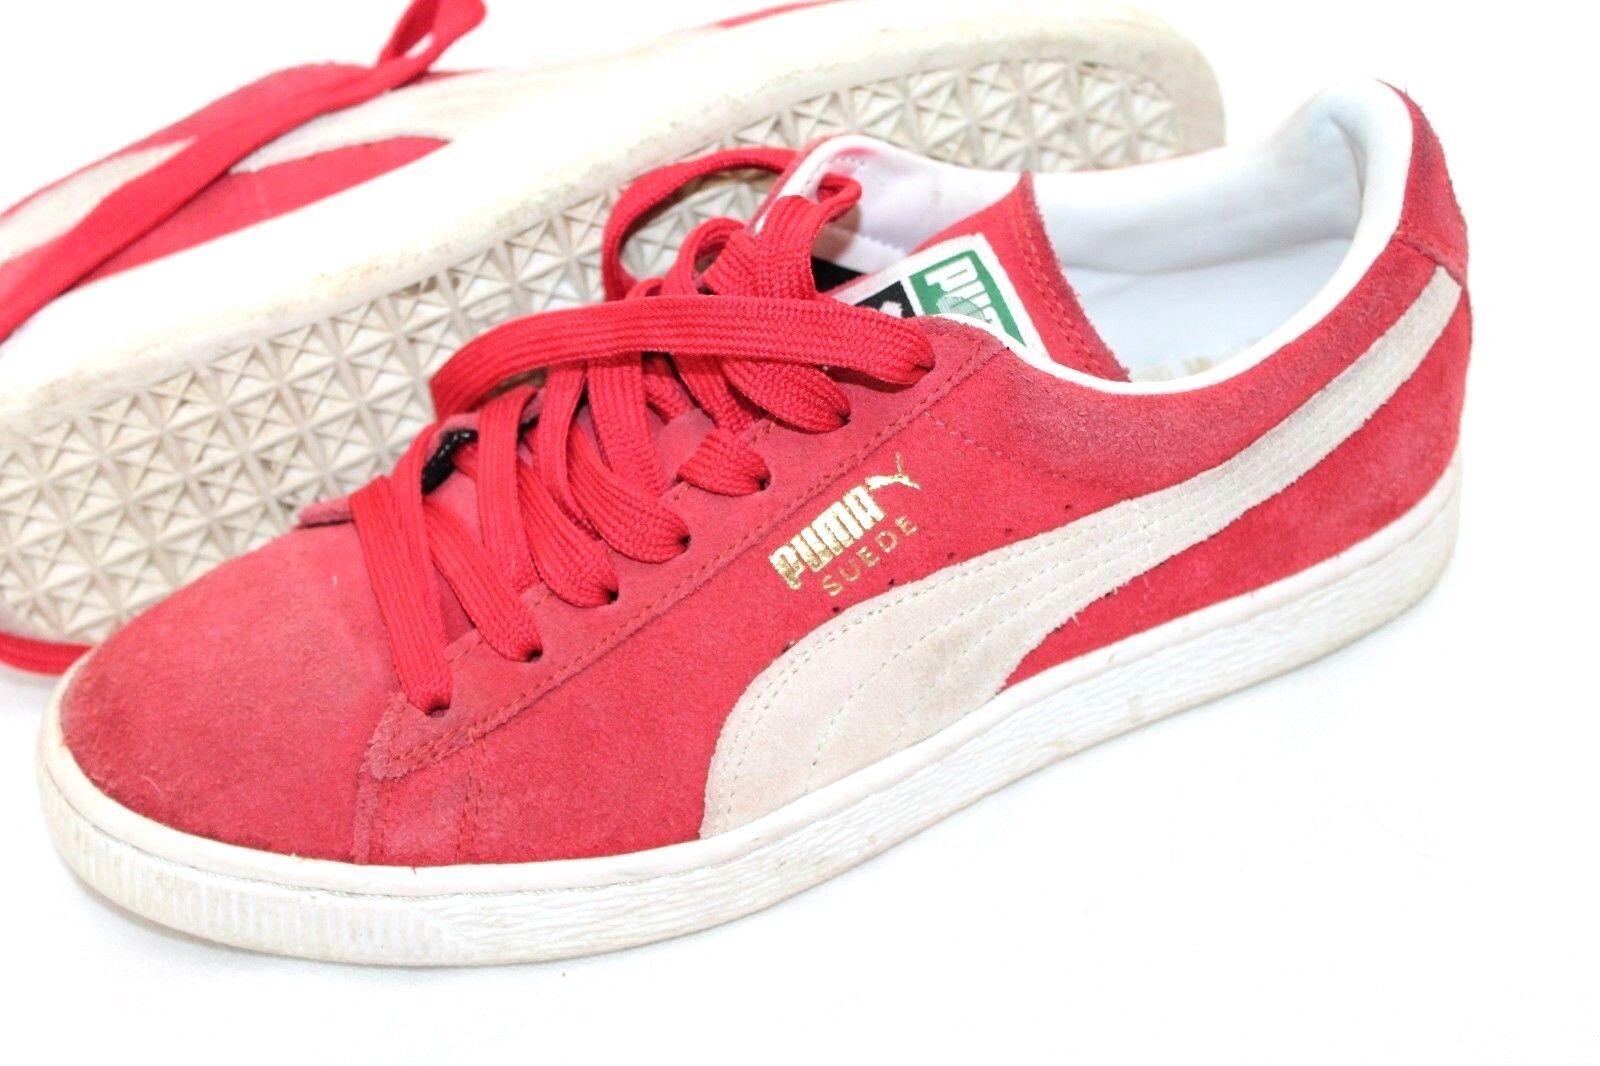 PUMA Size 7 Smash Men's Suede Shoes Red Retro Sneakers